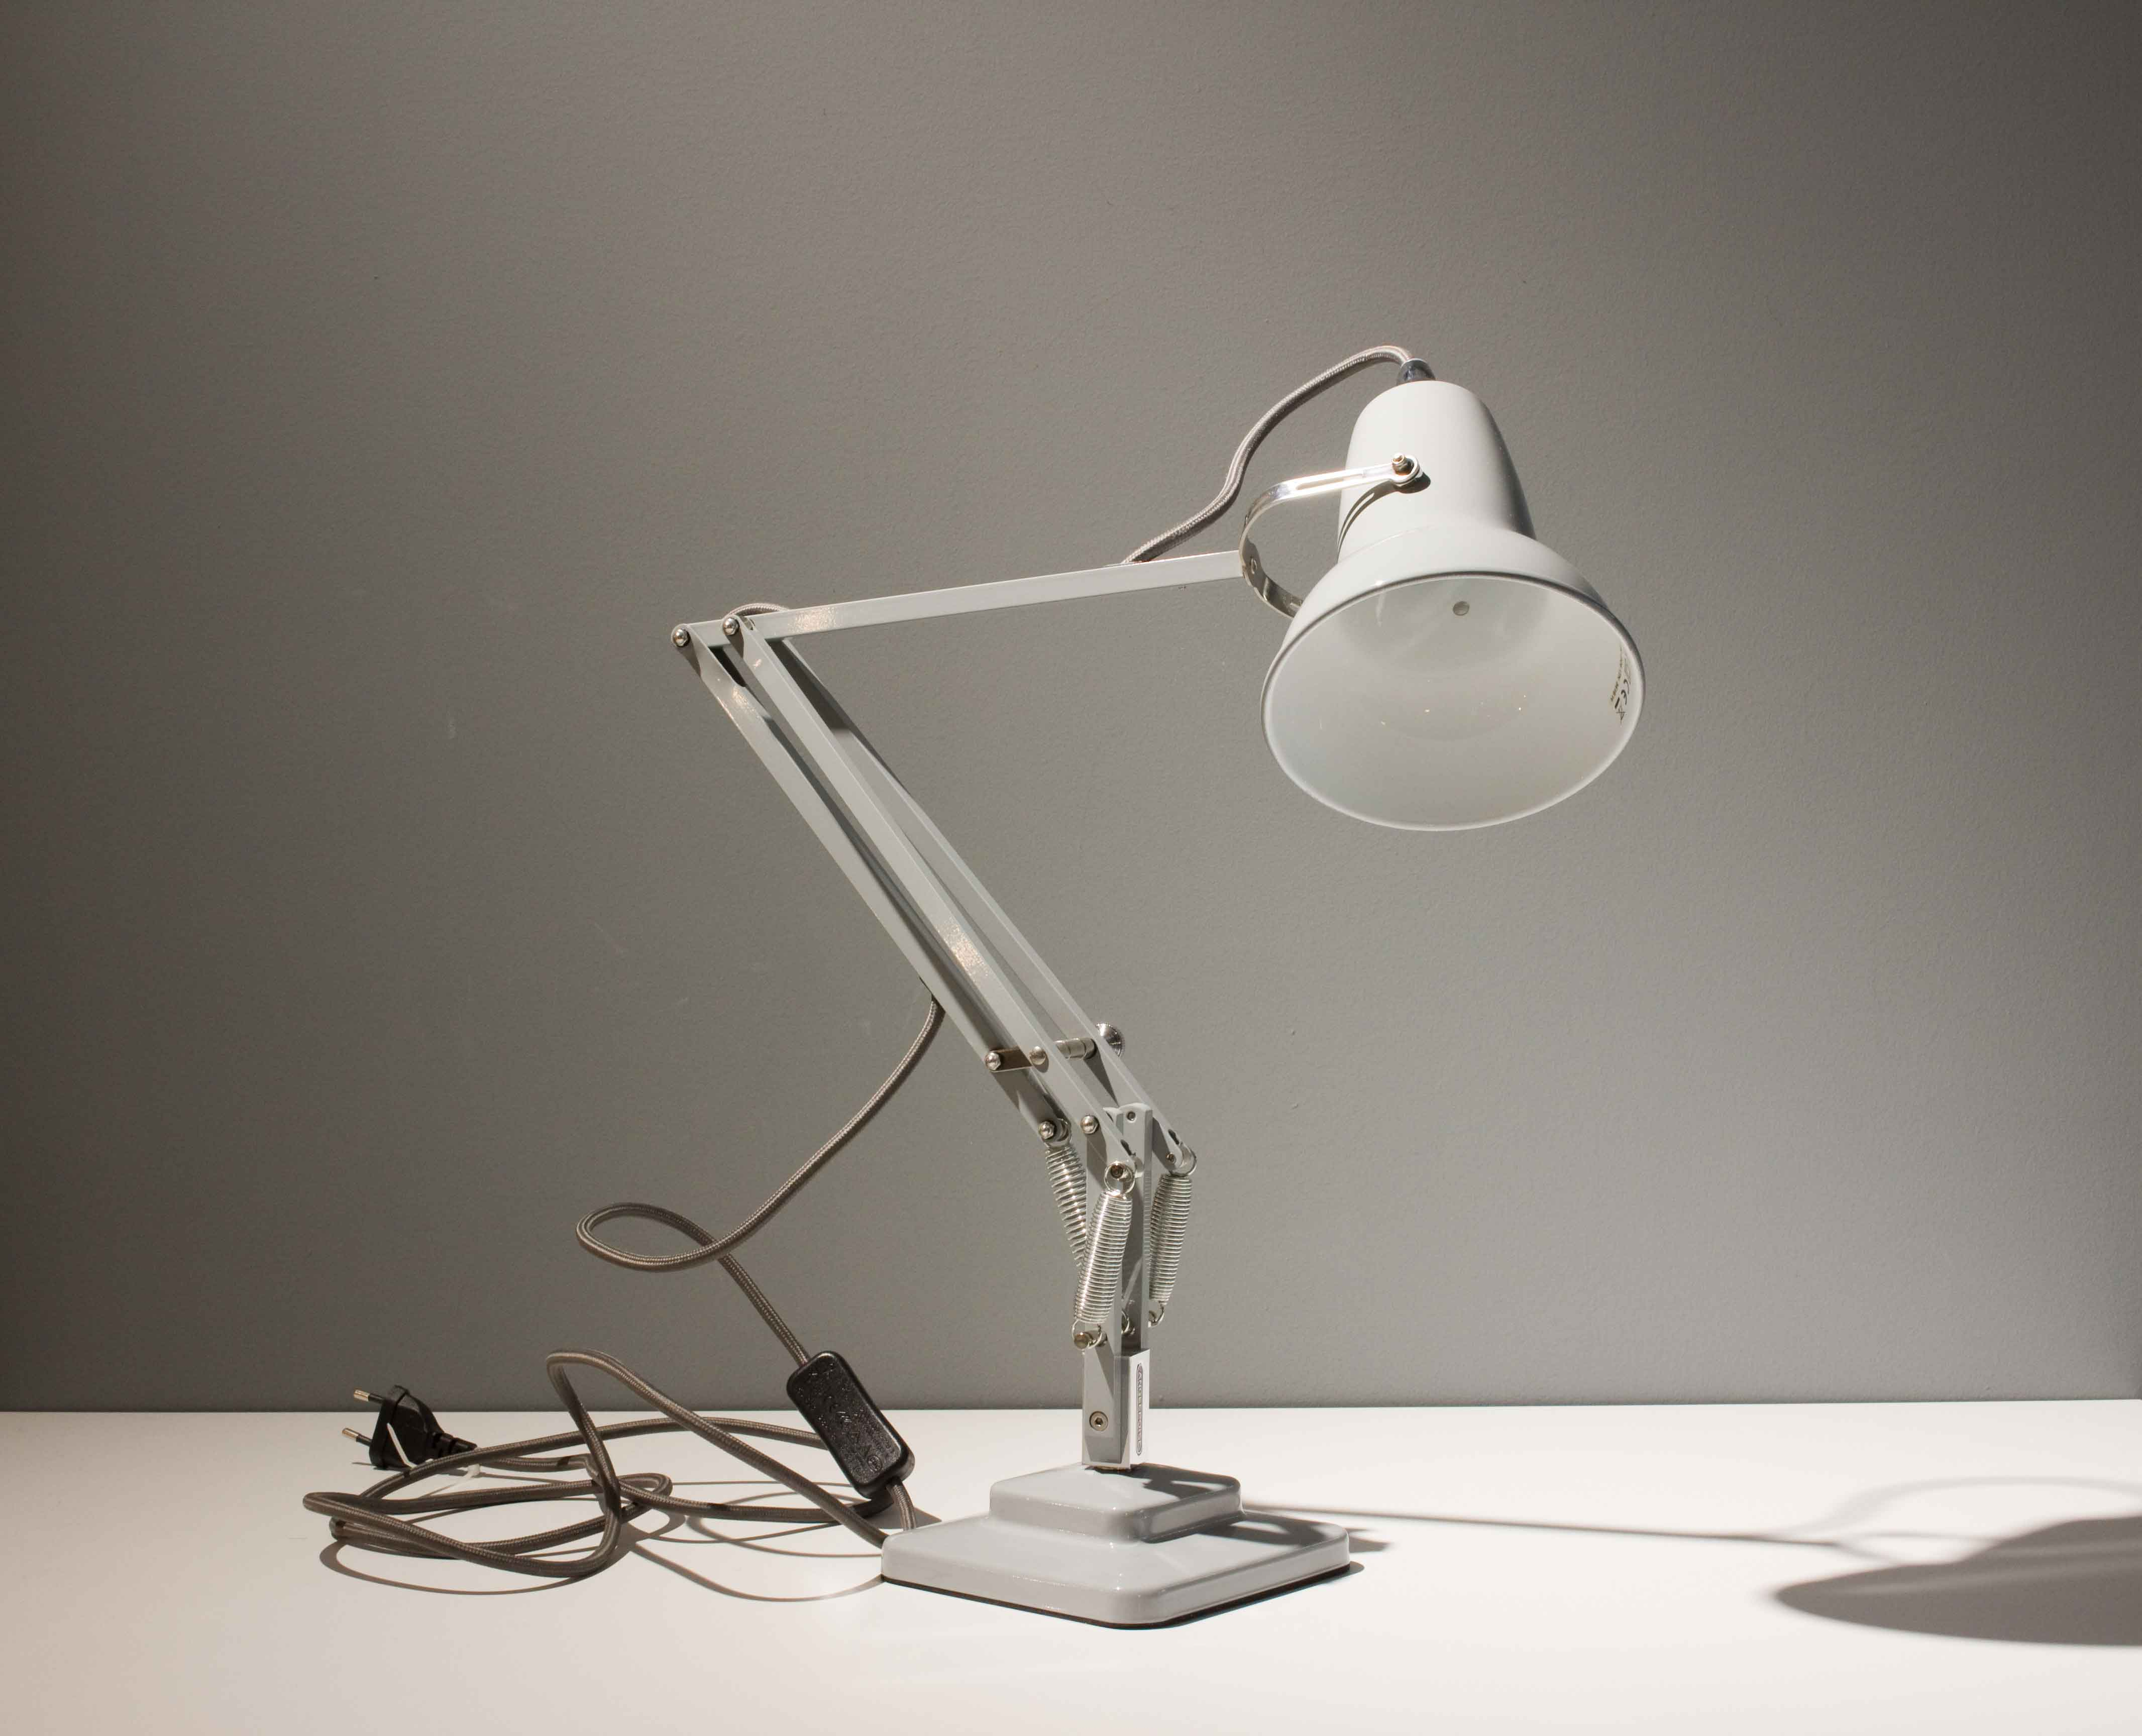 Original_1227_mini_desk_lamp-Anglepoise-Deesup